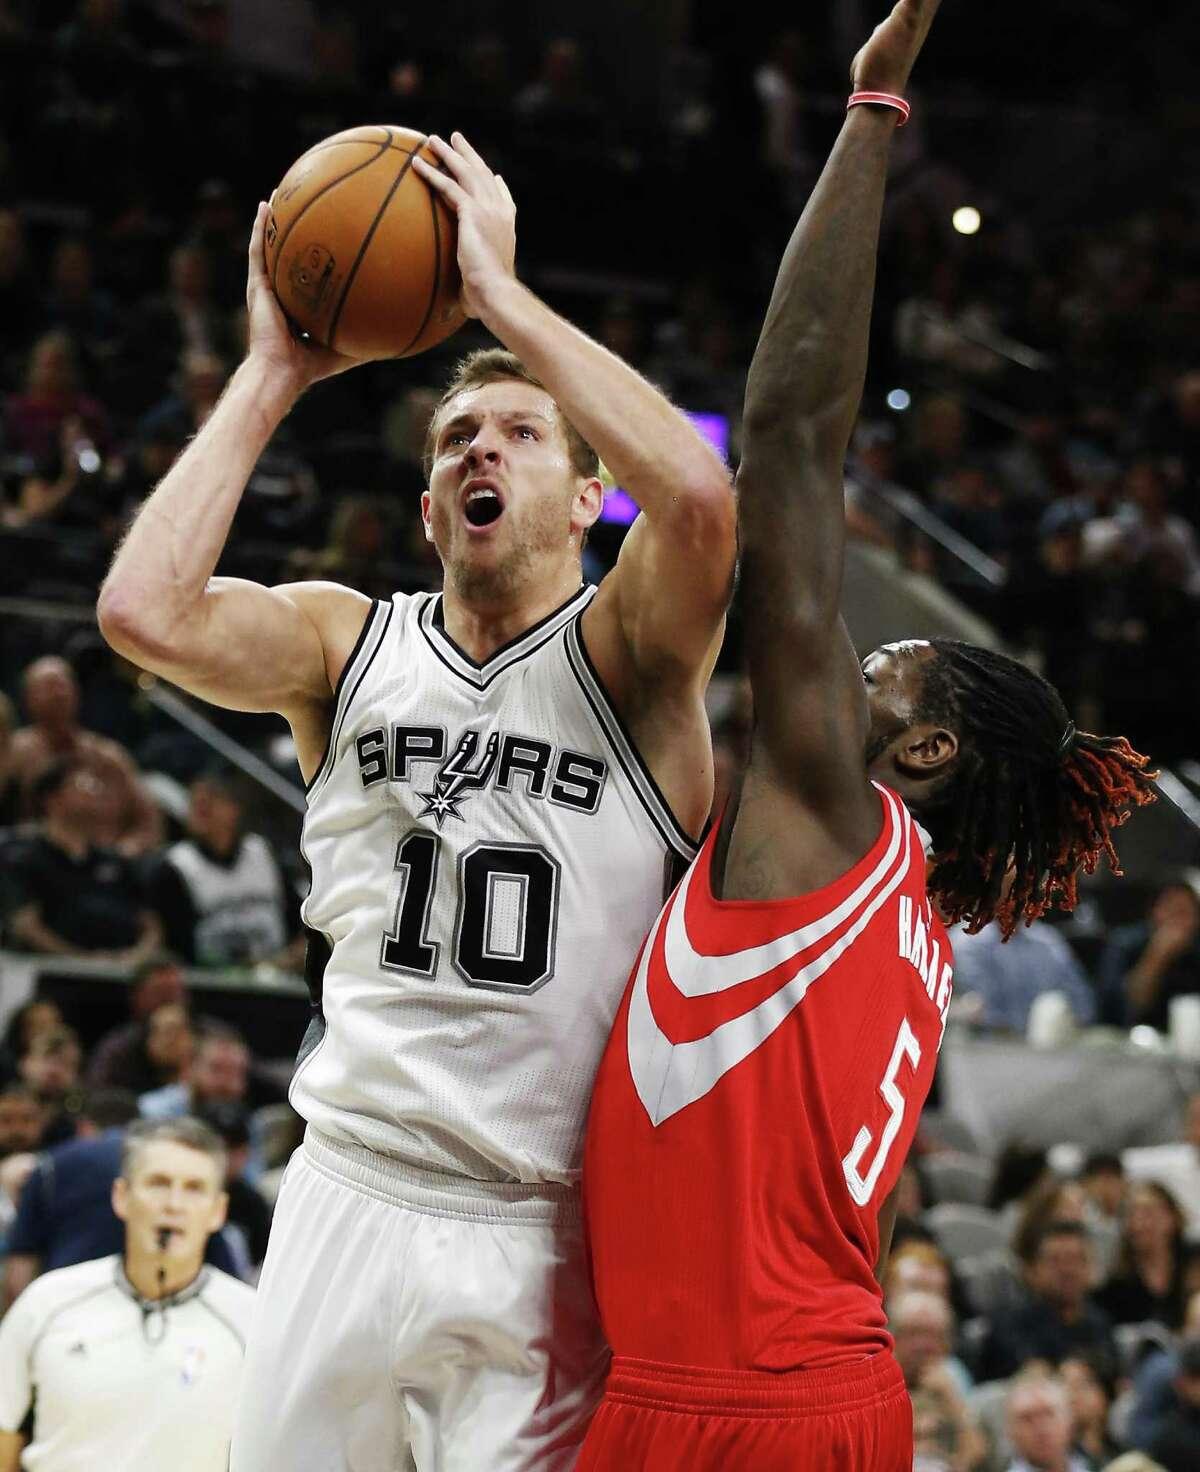 Spurs' David Lee (10) goes for a shot against the Houston Rockets' Montrezl Harrell (5) on Nov. 9, 2016.